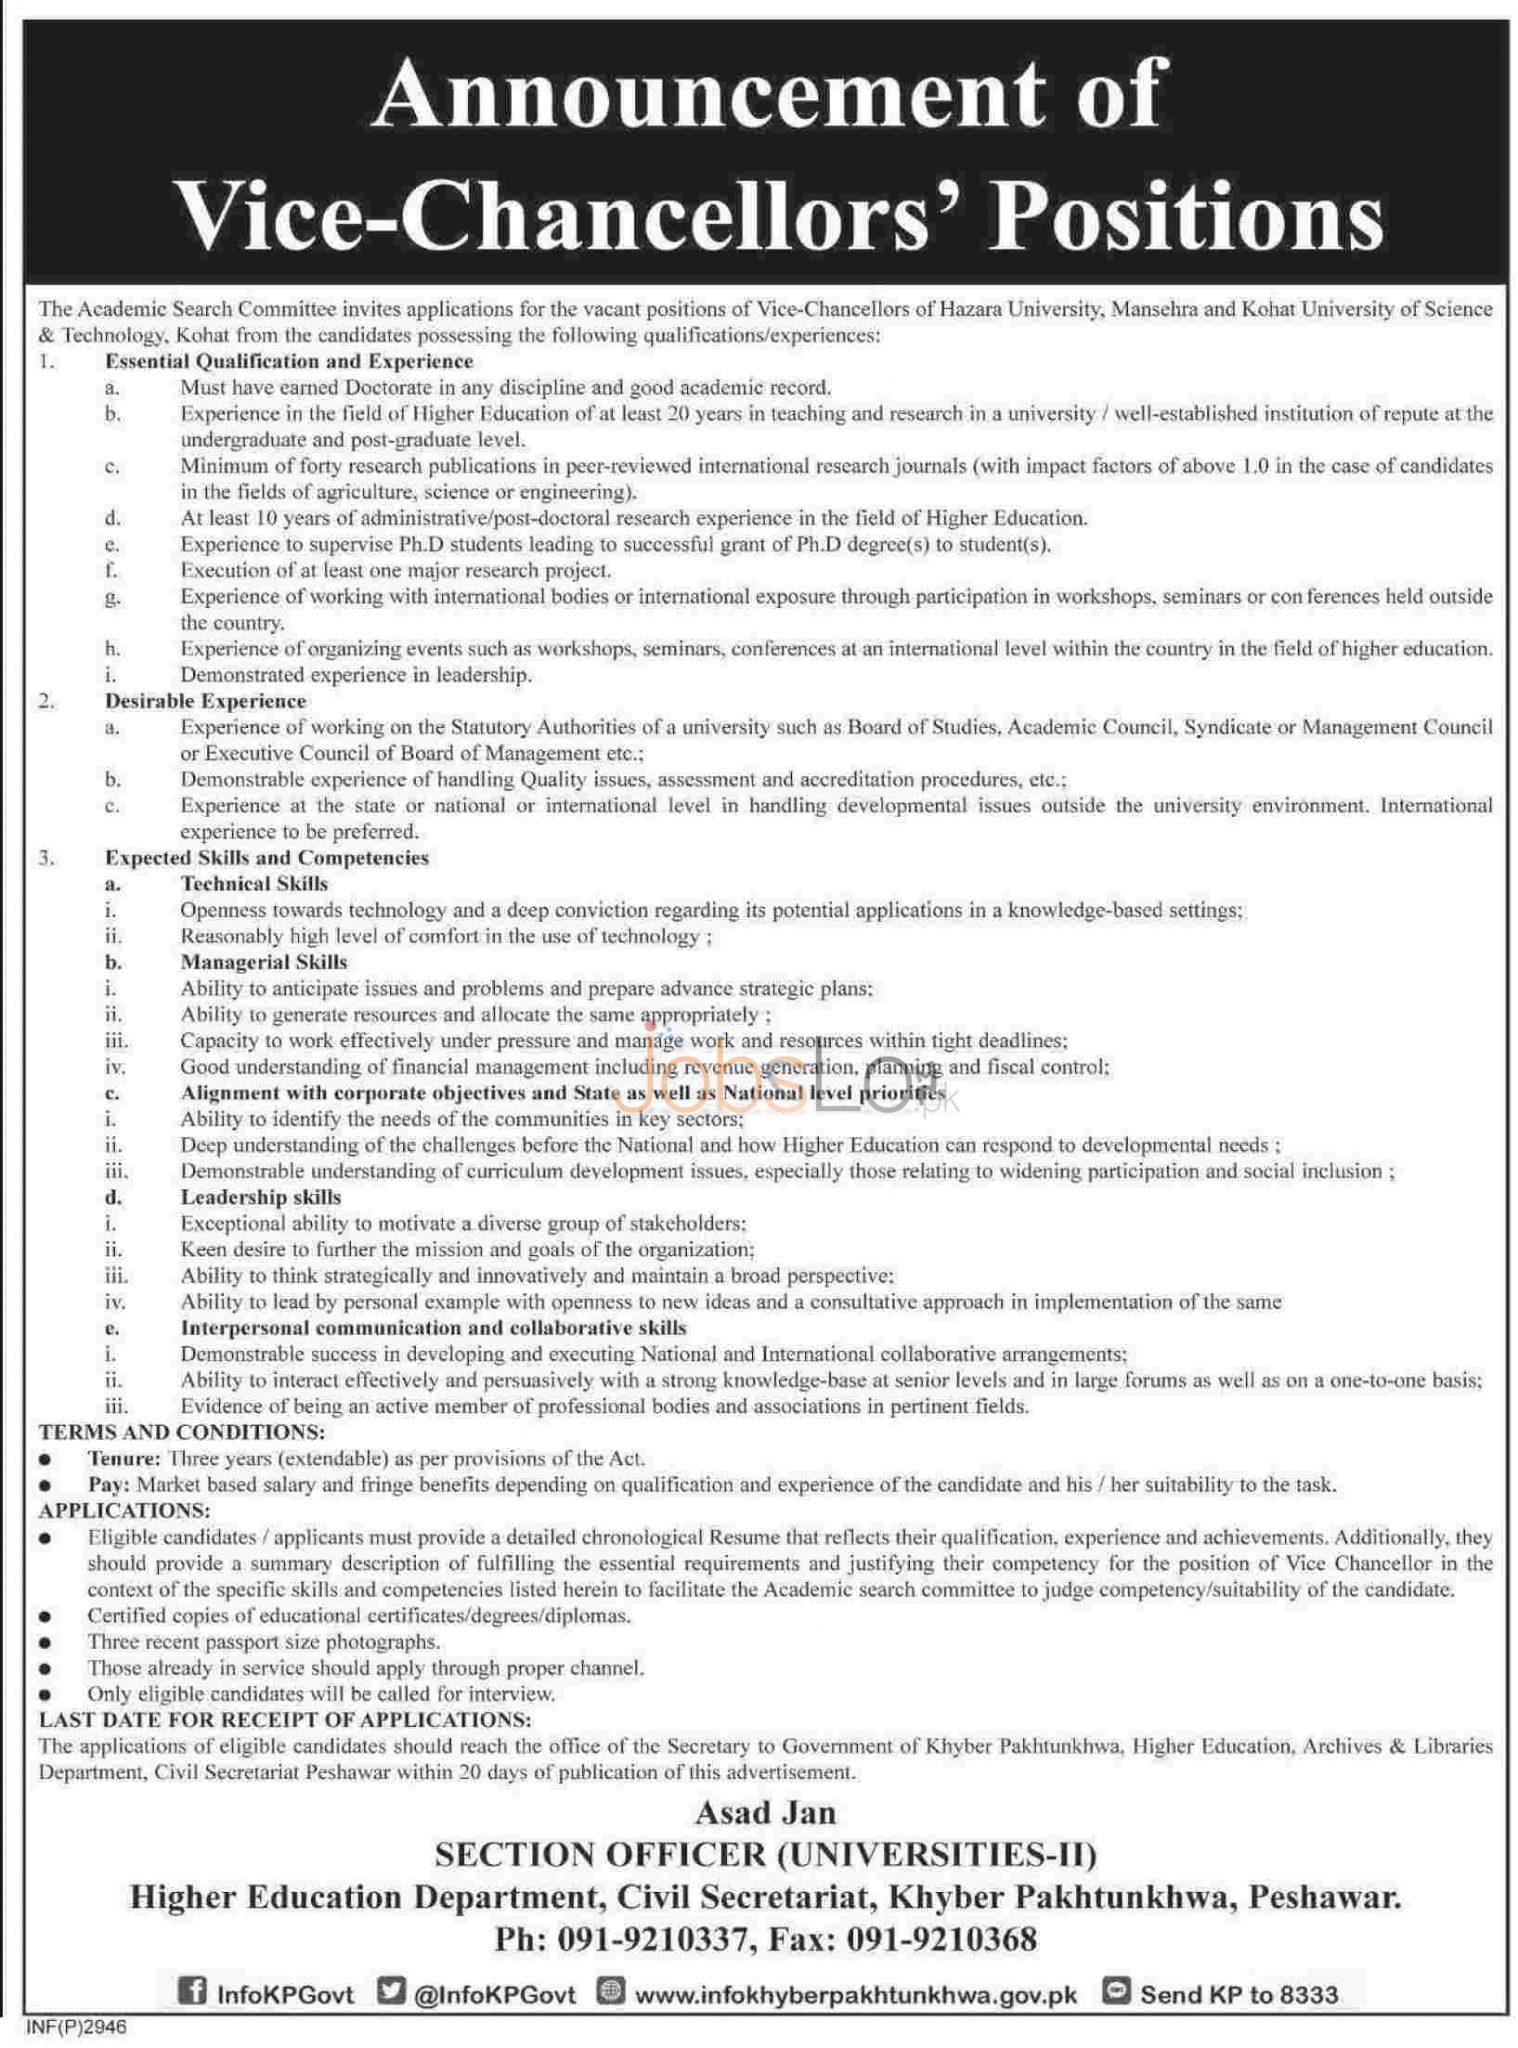 Higher Education Department KPK Jobs